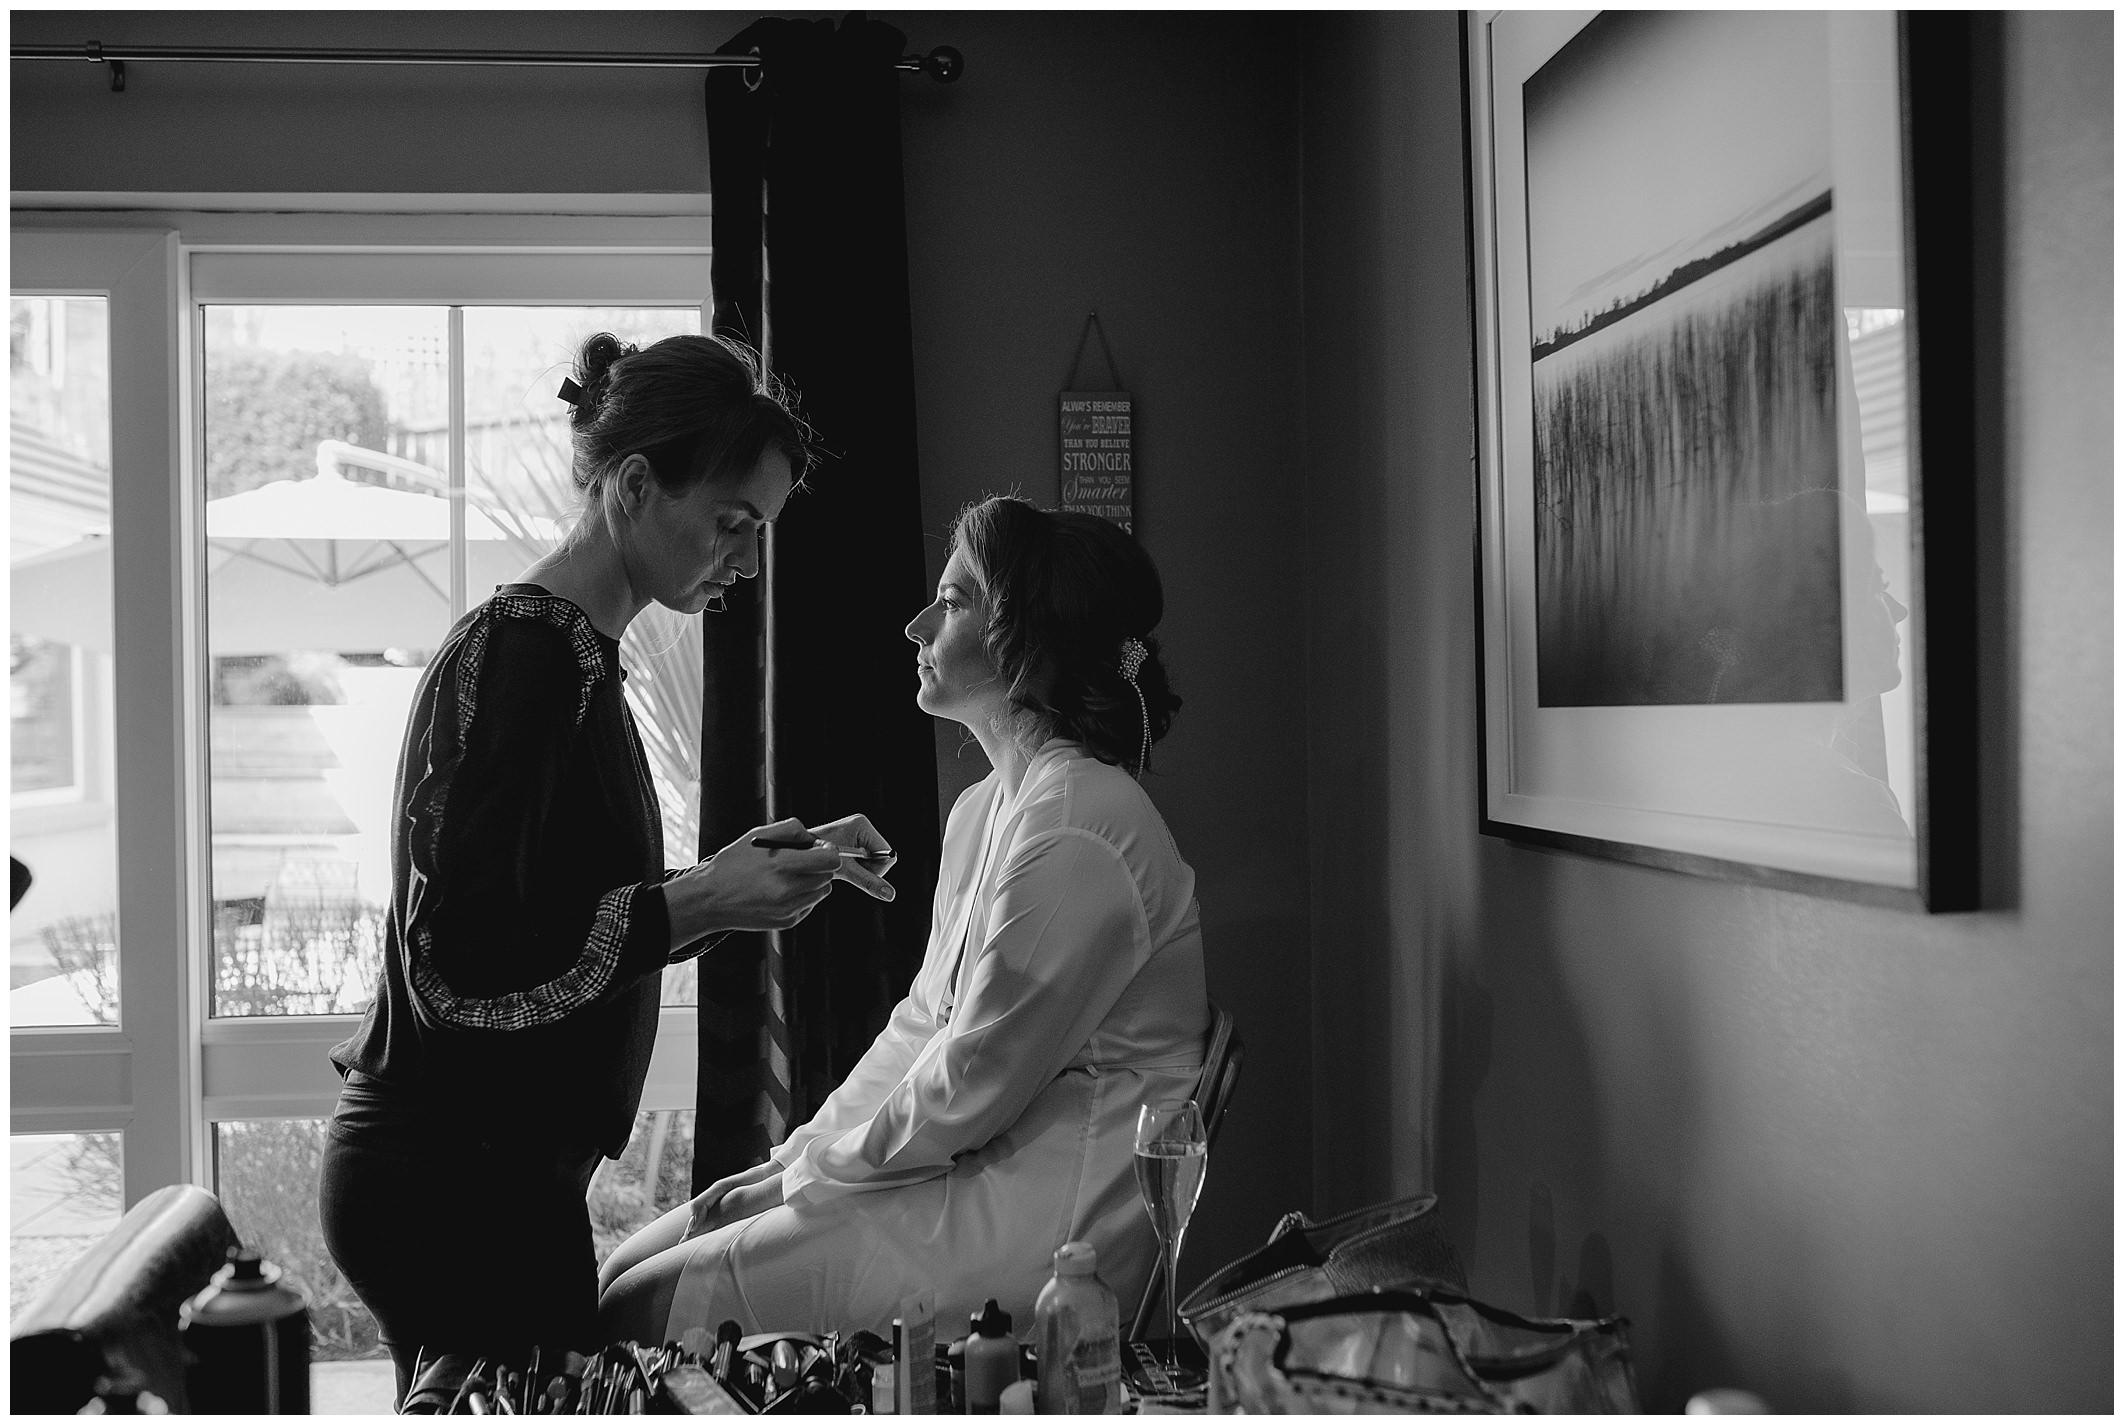 corick-house-wedding-hannah-gary-jude-browne-photography_0009.jpg